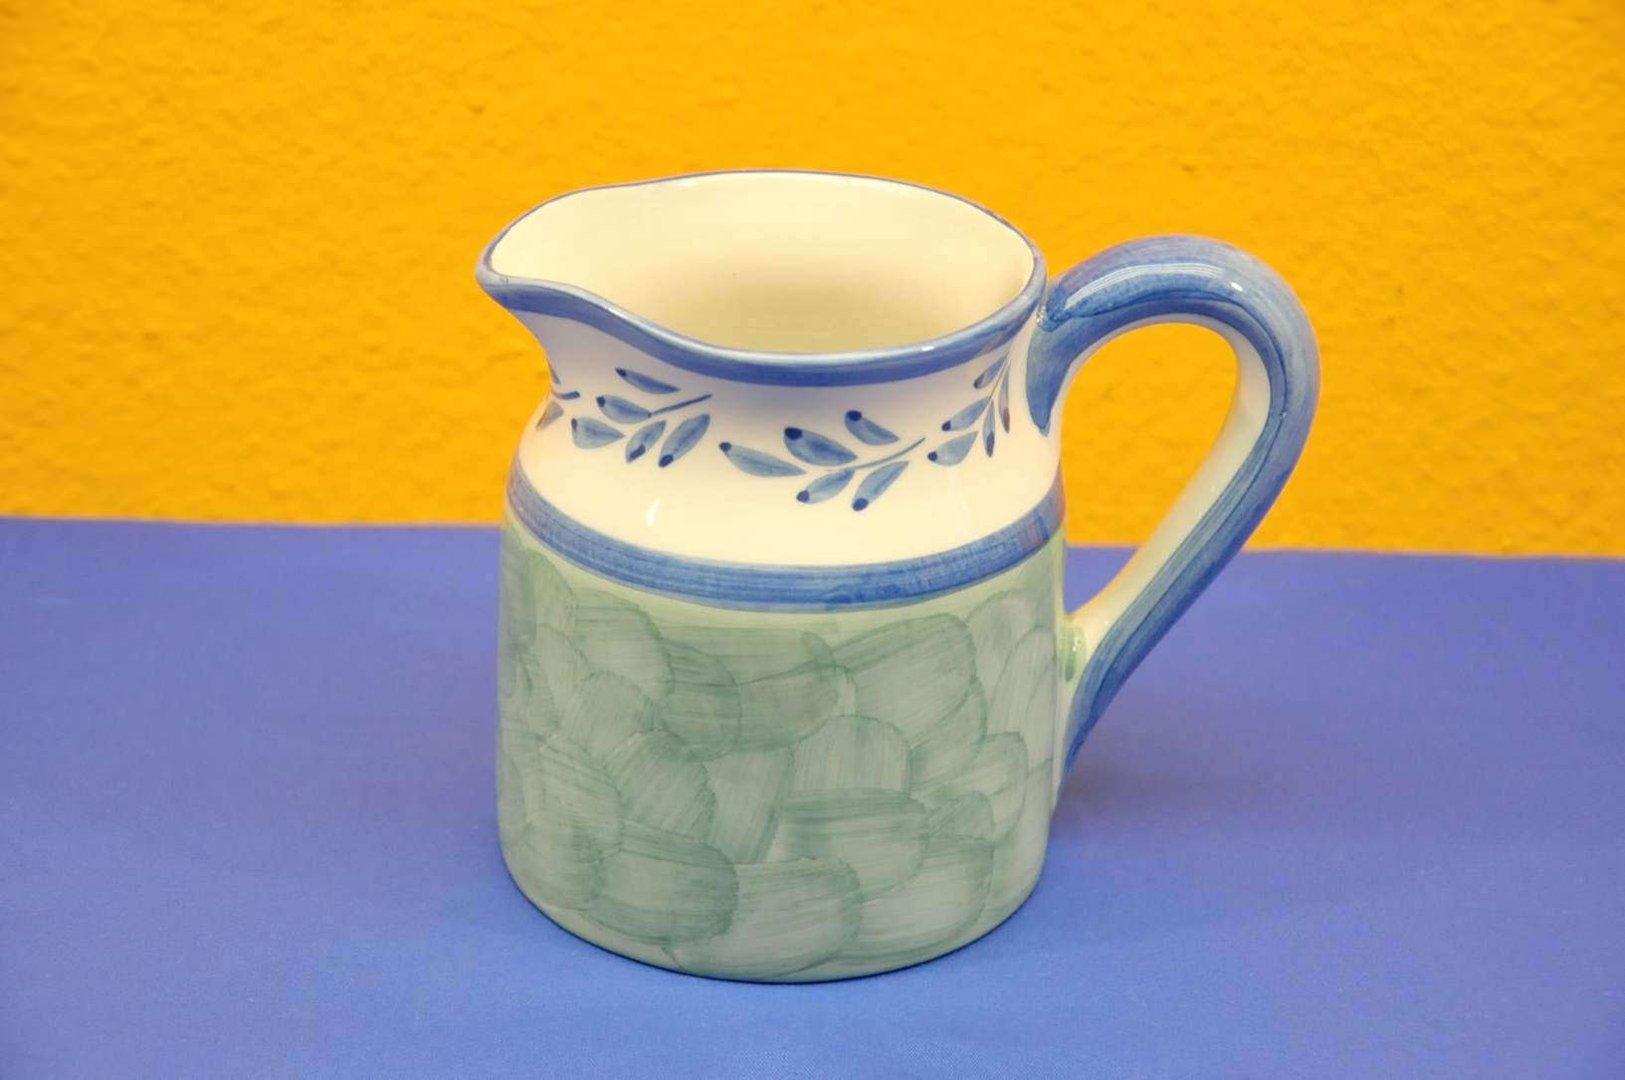 Villeroy boch gallo switch 3 milk jug buy at shop kusera - Villeroy y boch ...